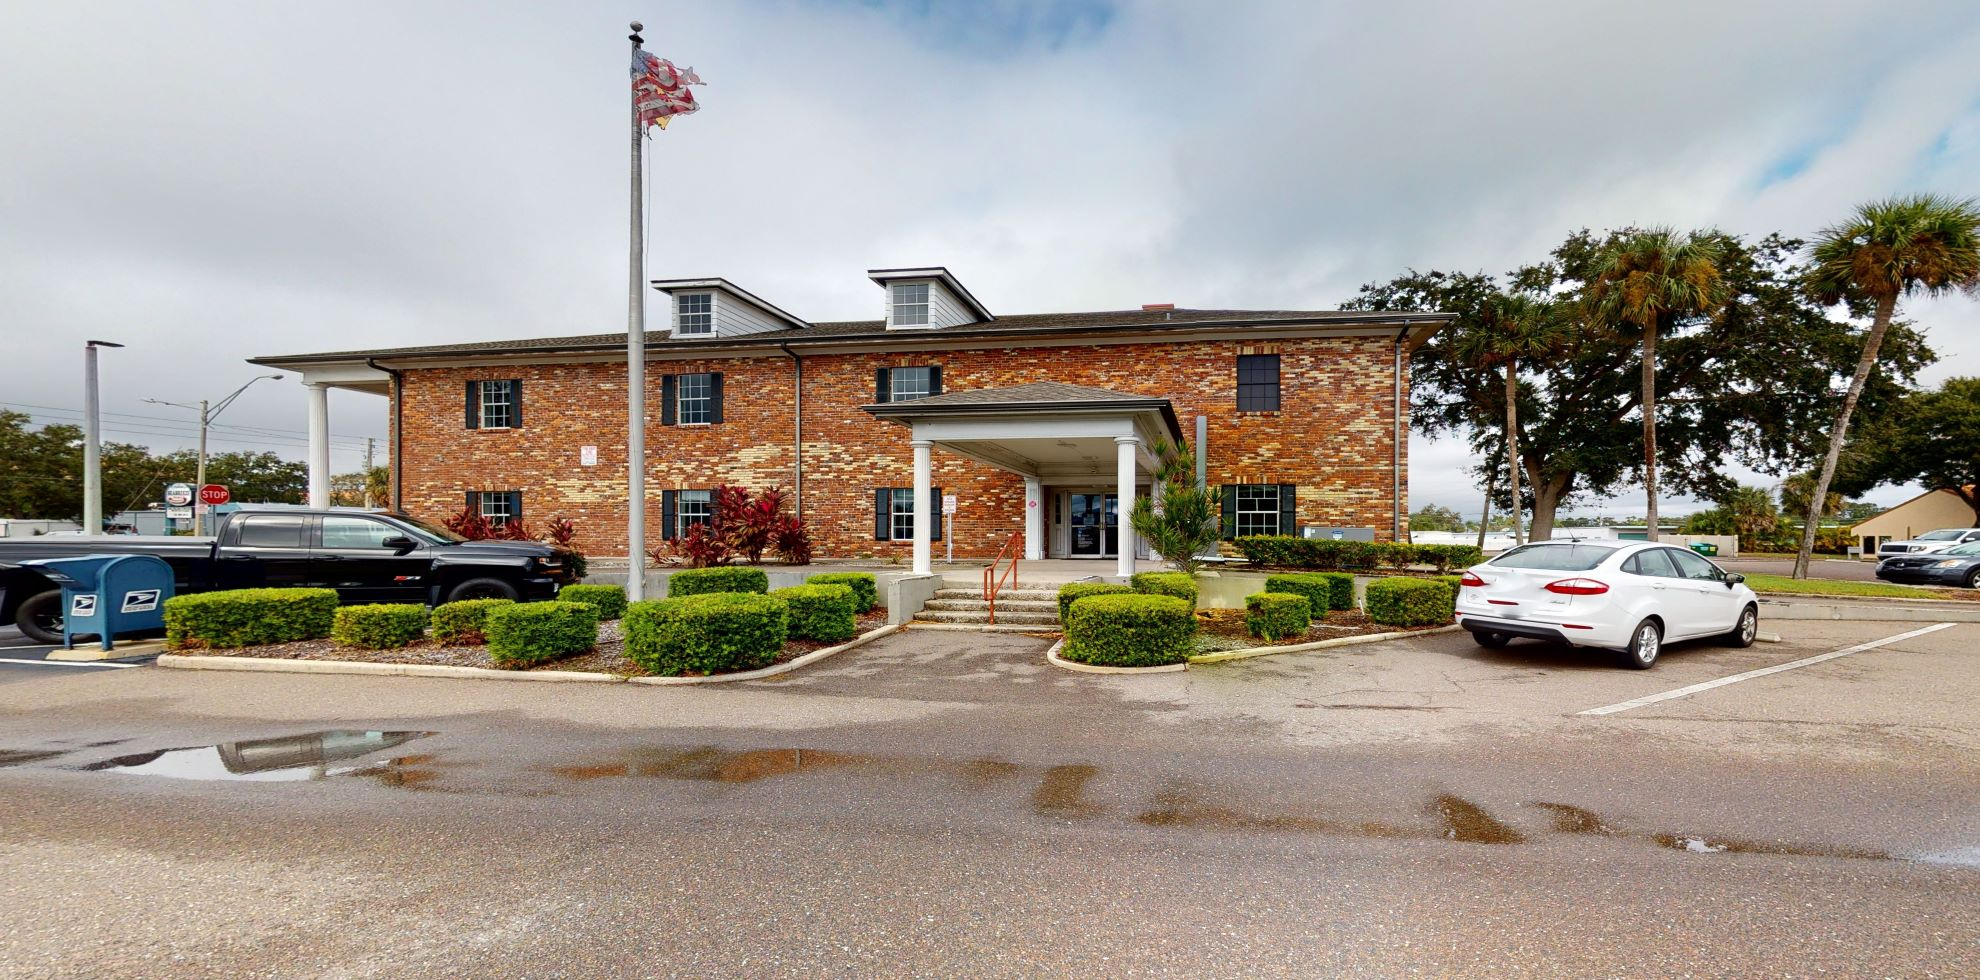 Bank of America financial center with drive-thru ATM   6801 Seminole Blvd, Seminole, FL 33772